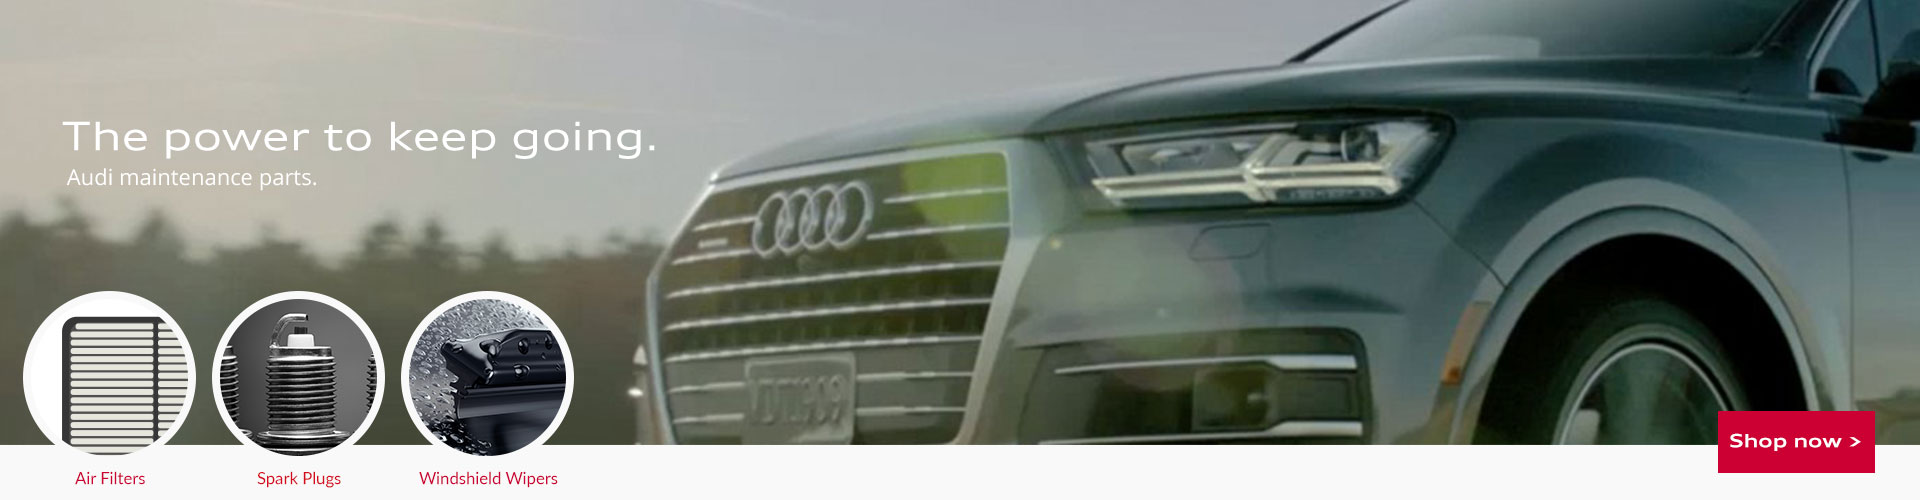 Circle Audi New Audi Dealership In Long Beach CA - Audi parts online